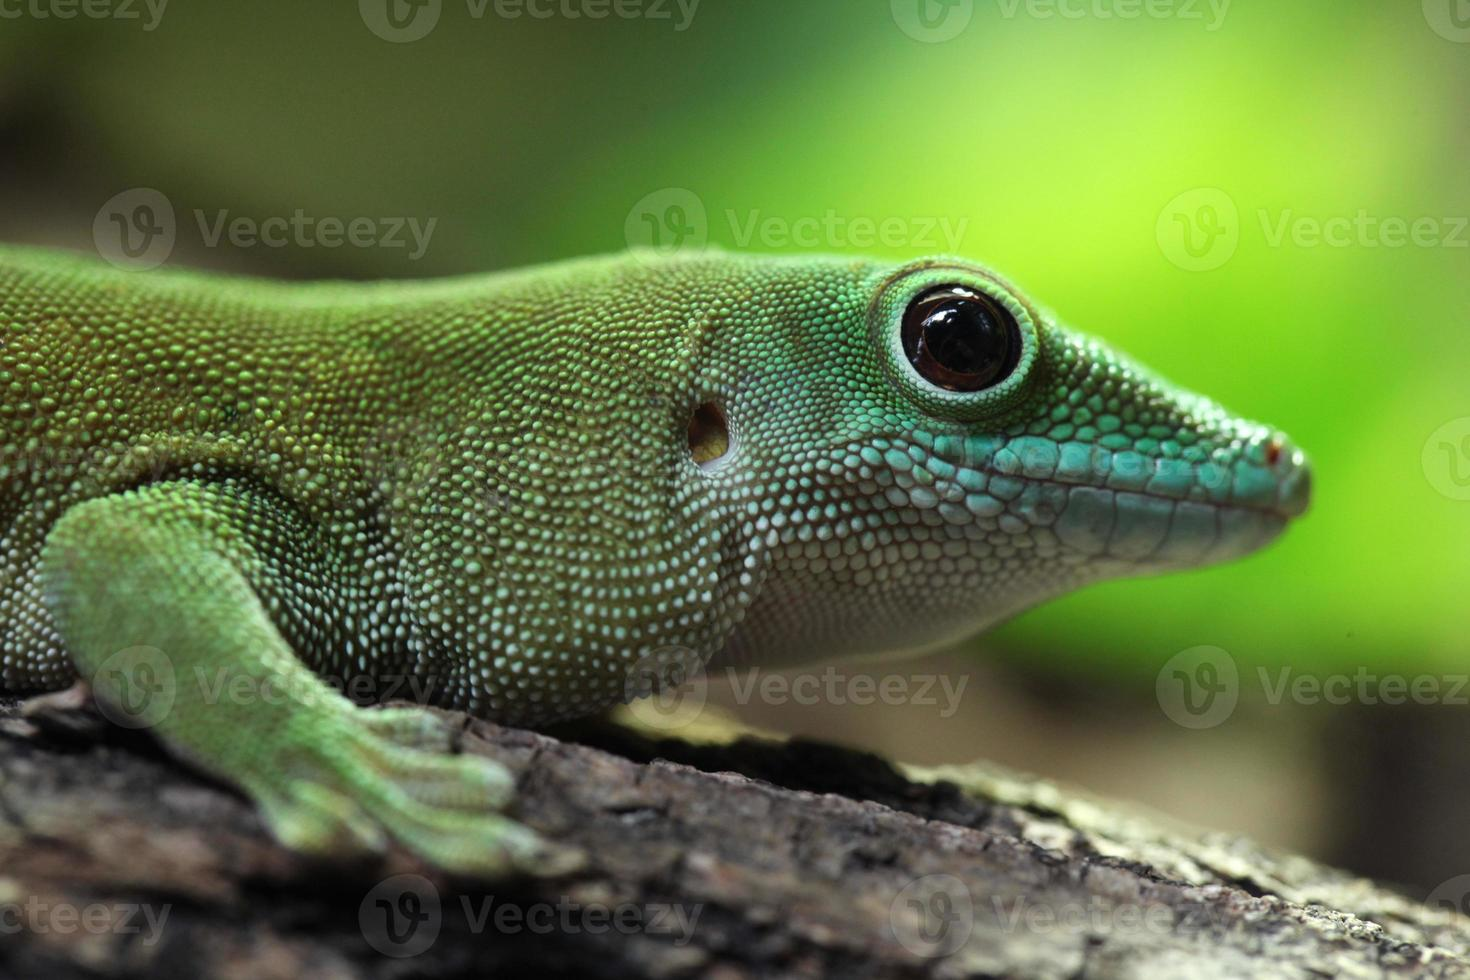 Koch's giant day gecko (Phelsuma madagascariensis kochi). photo